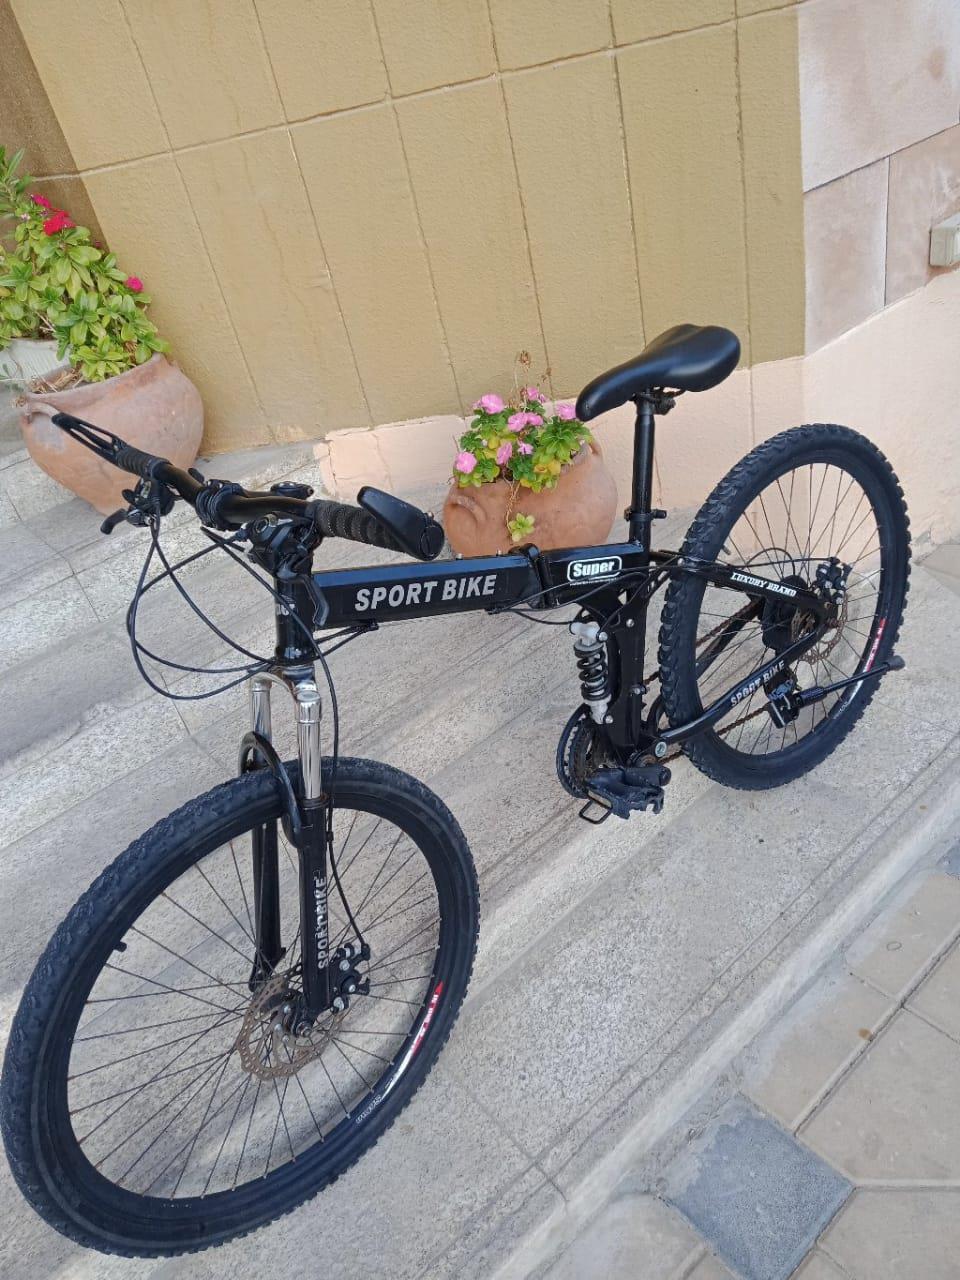 Super sport folding MTB 26in bike for sale in Dubai - Image 2